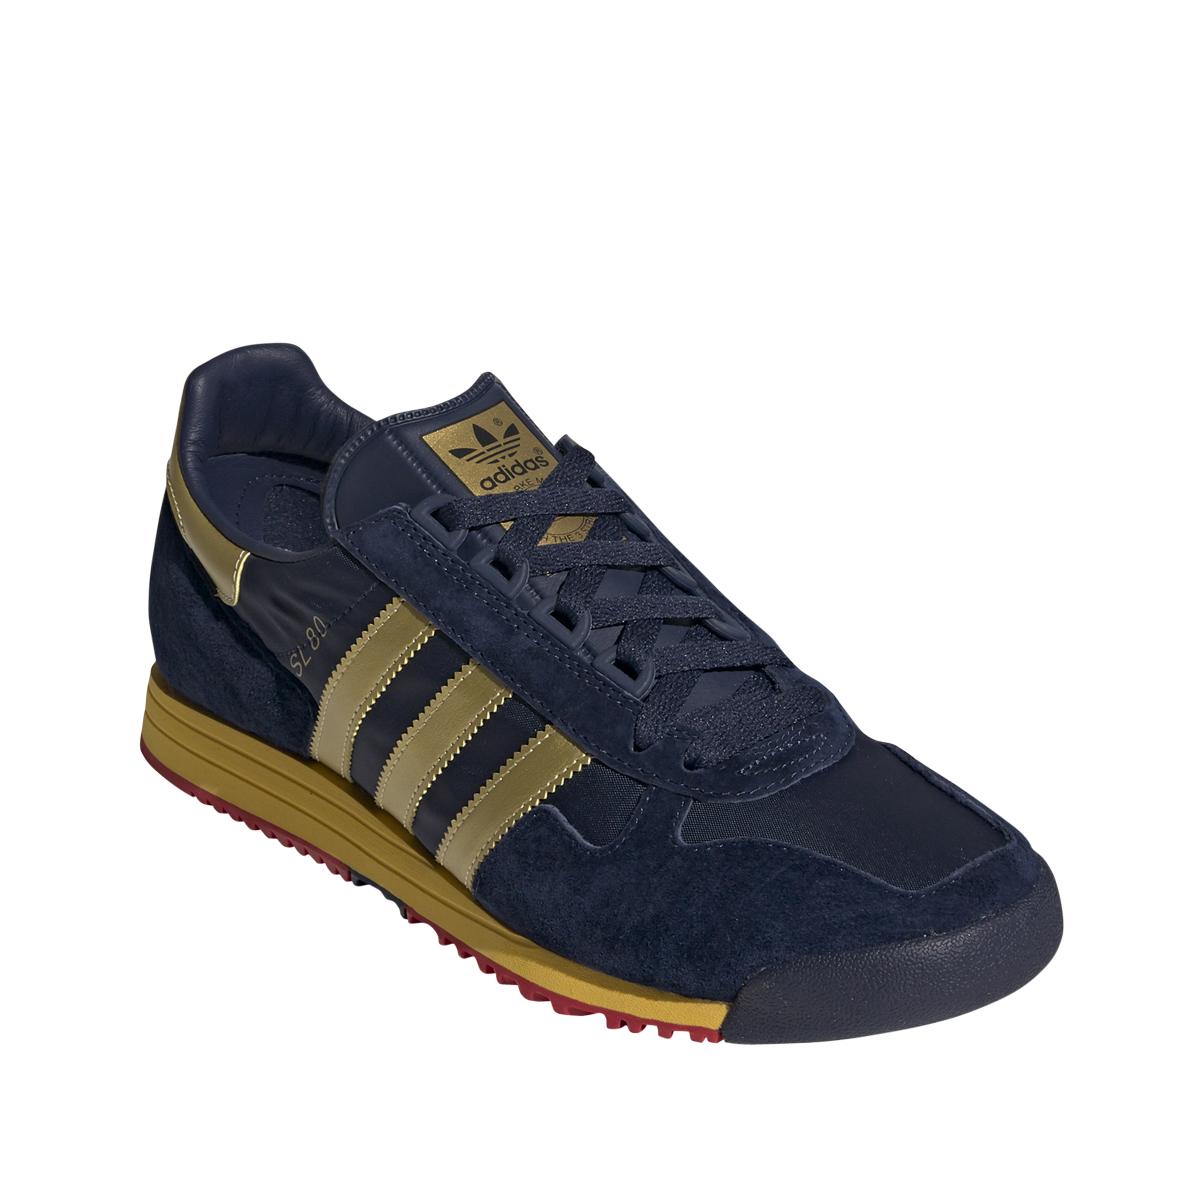 adidas Spezial SL Runner